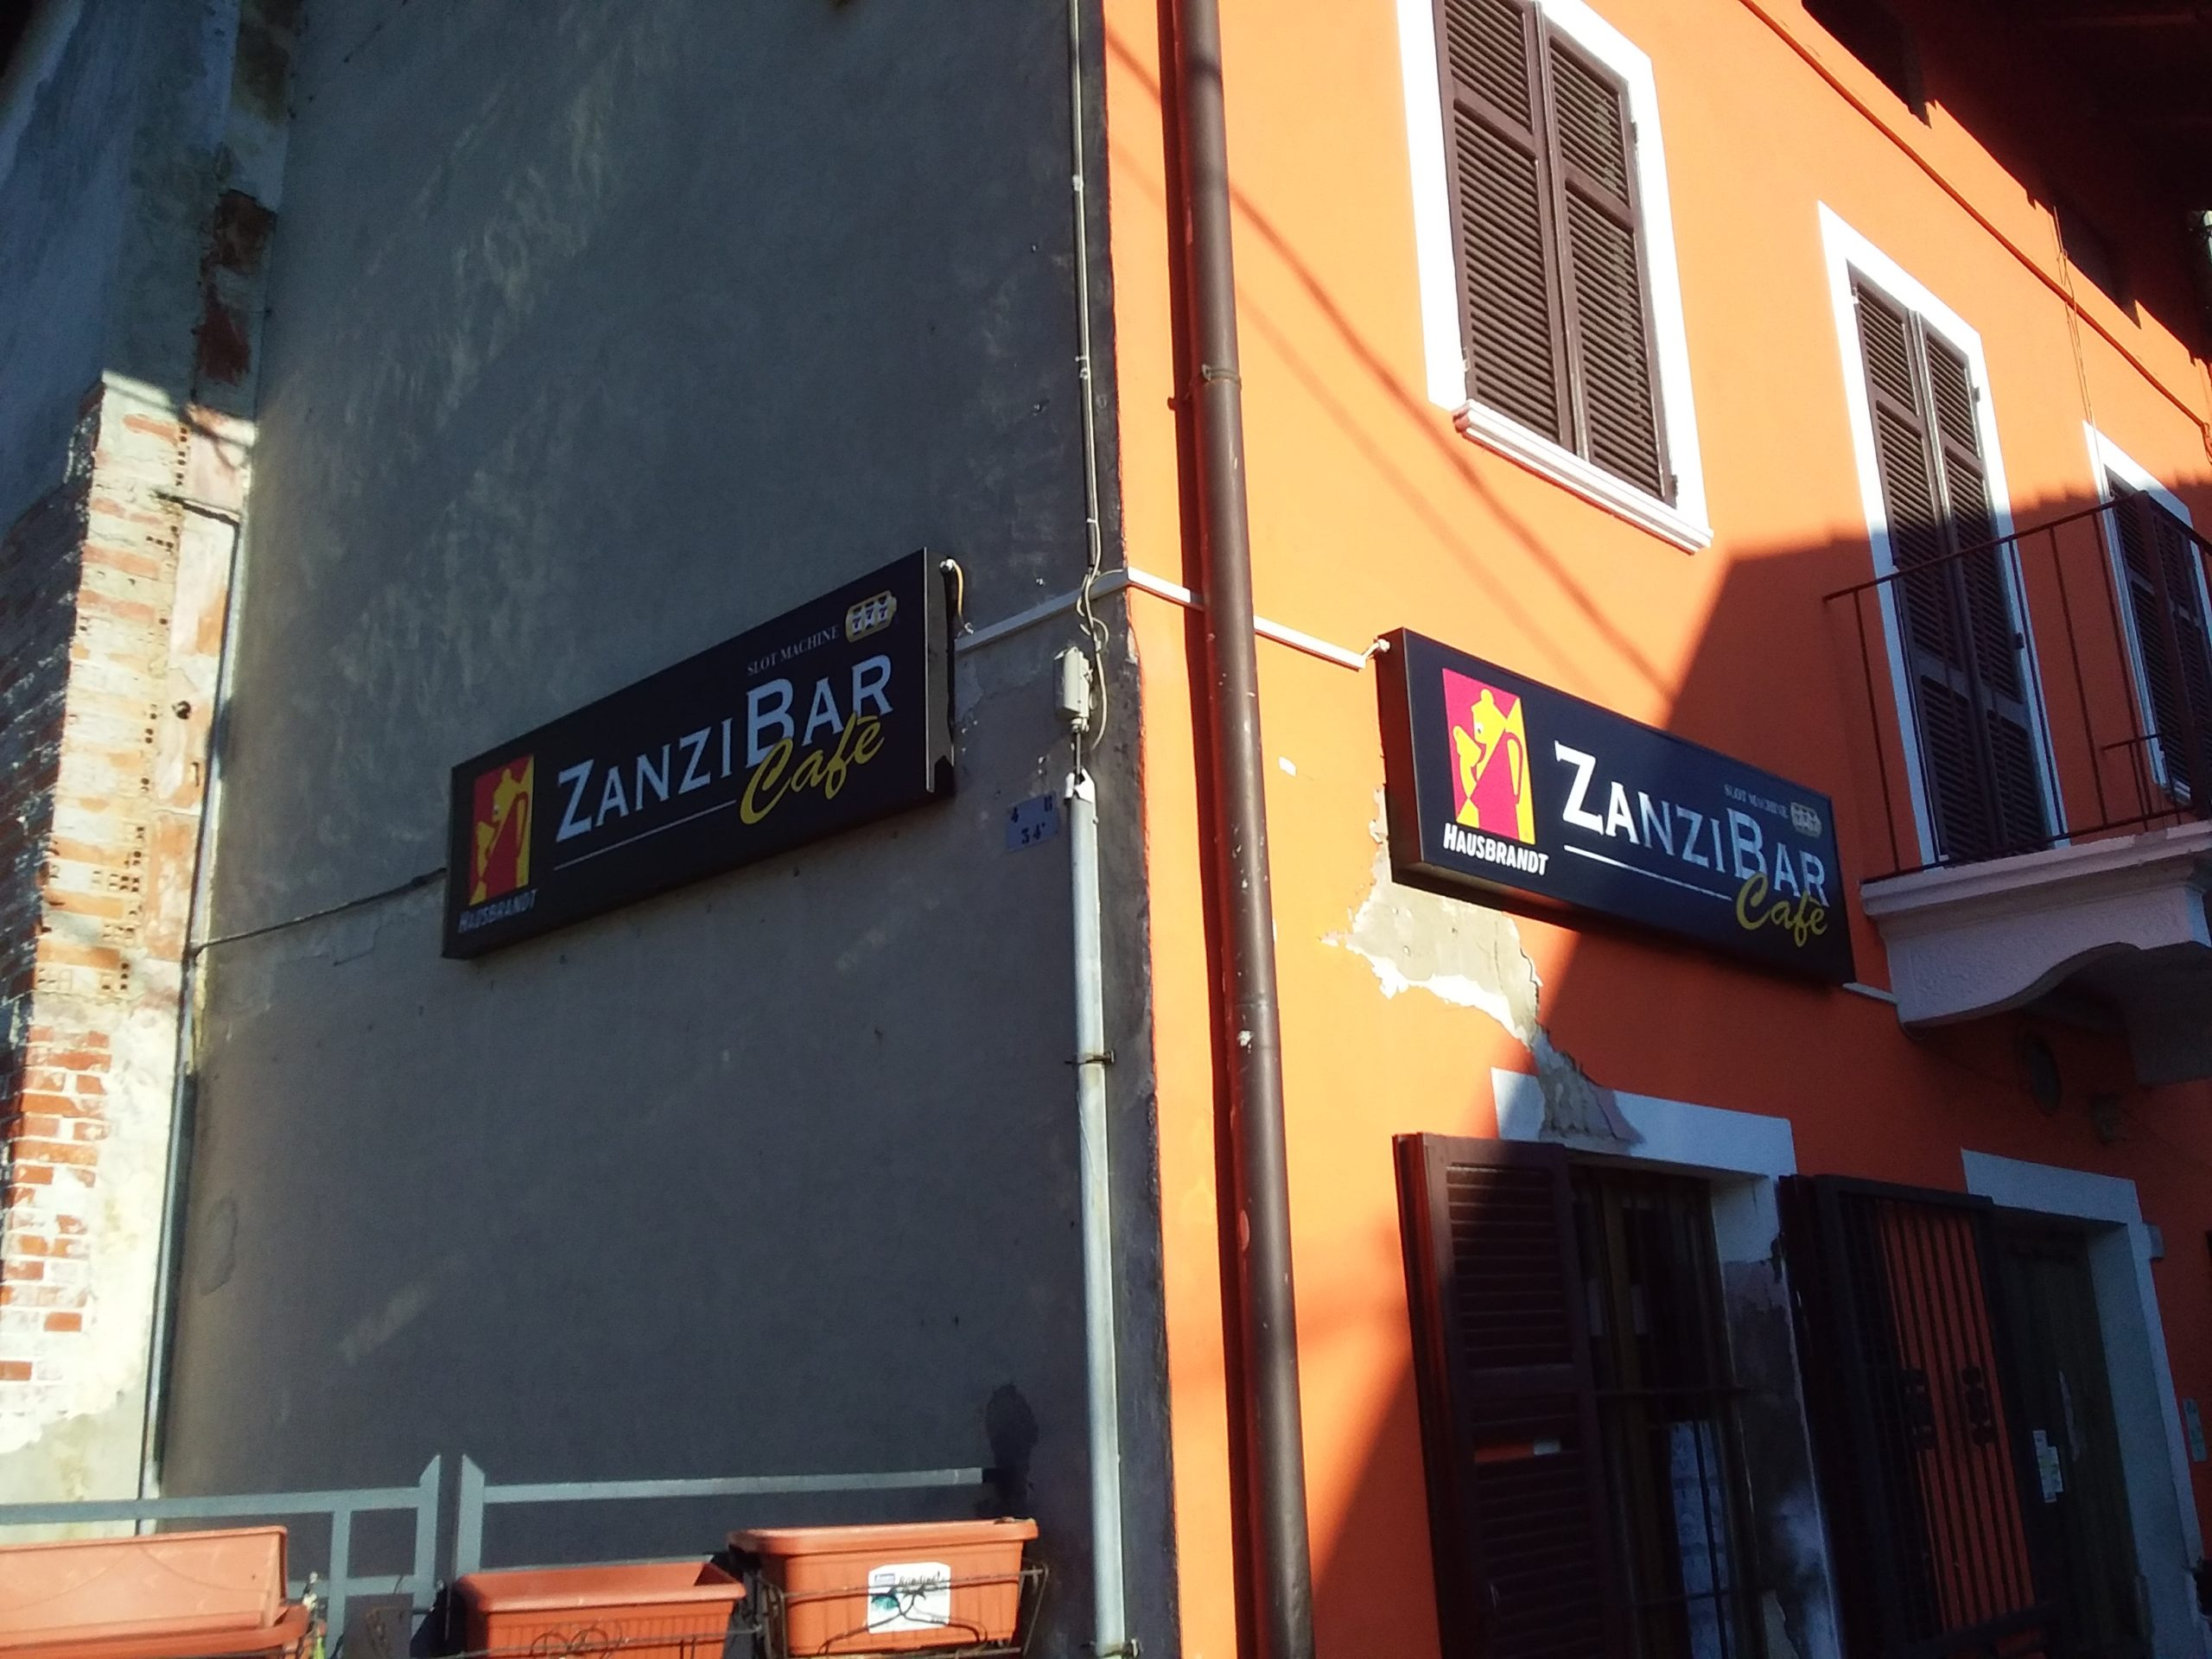 insegna luminosa Zanzibar Cafè